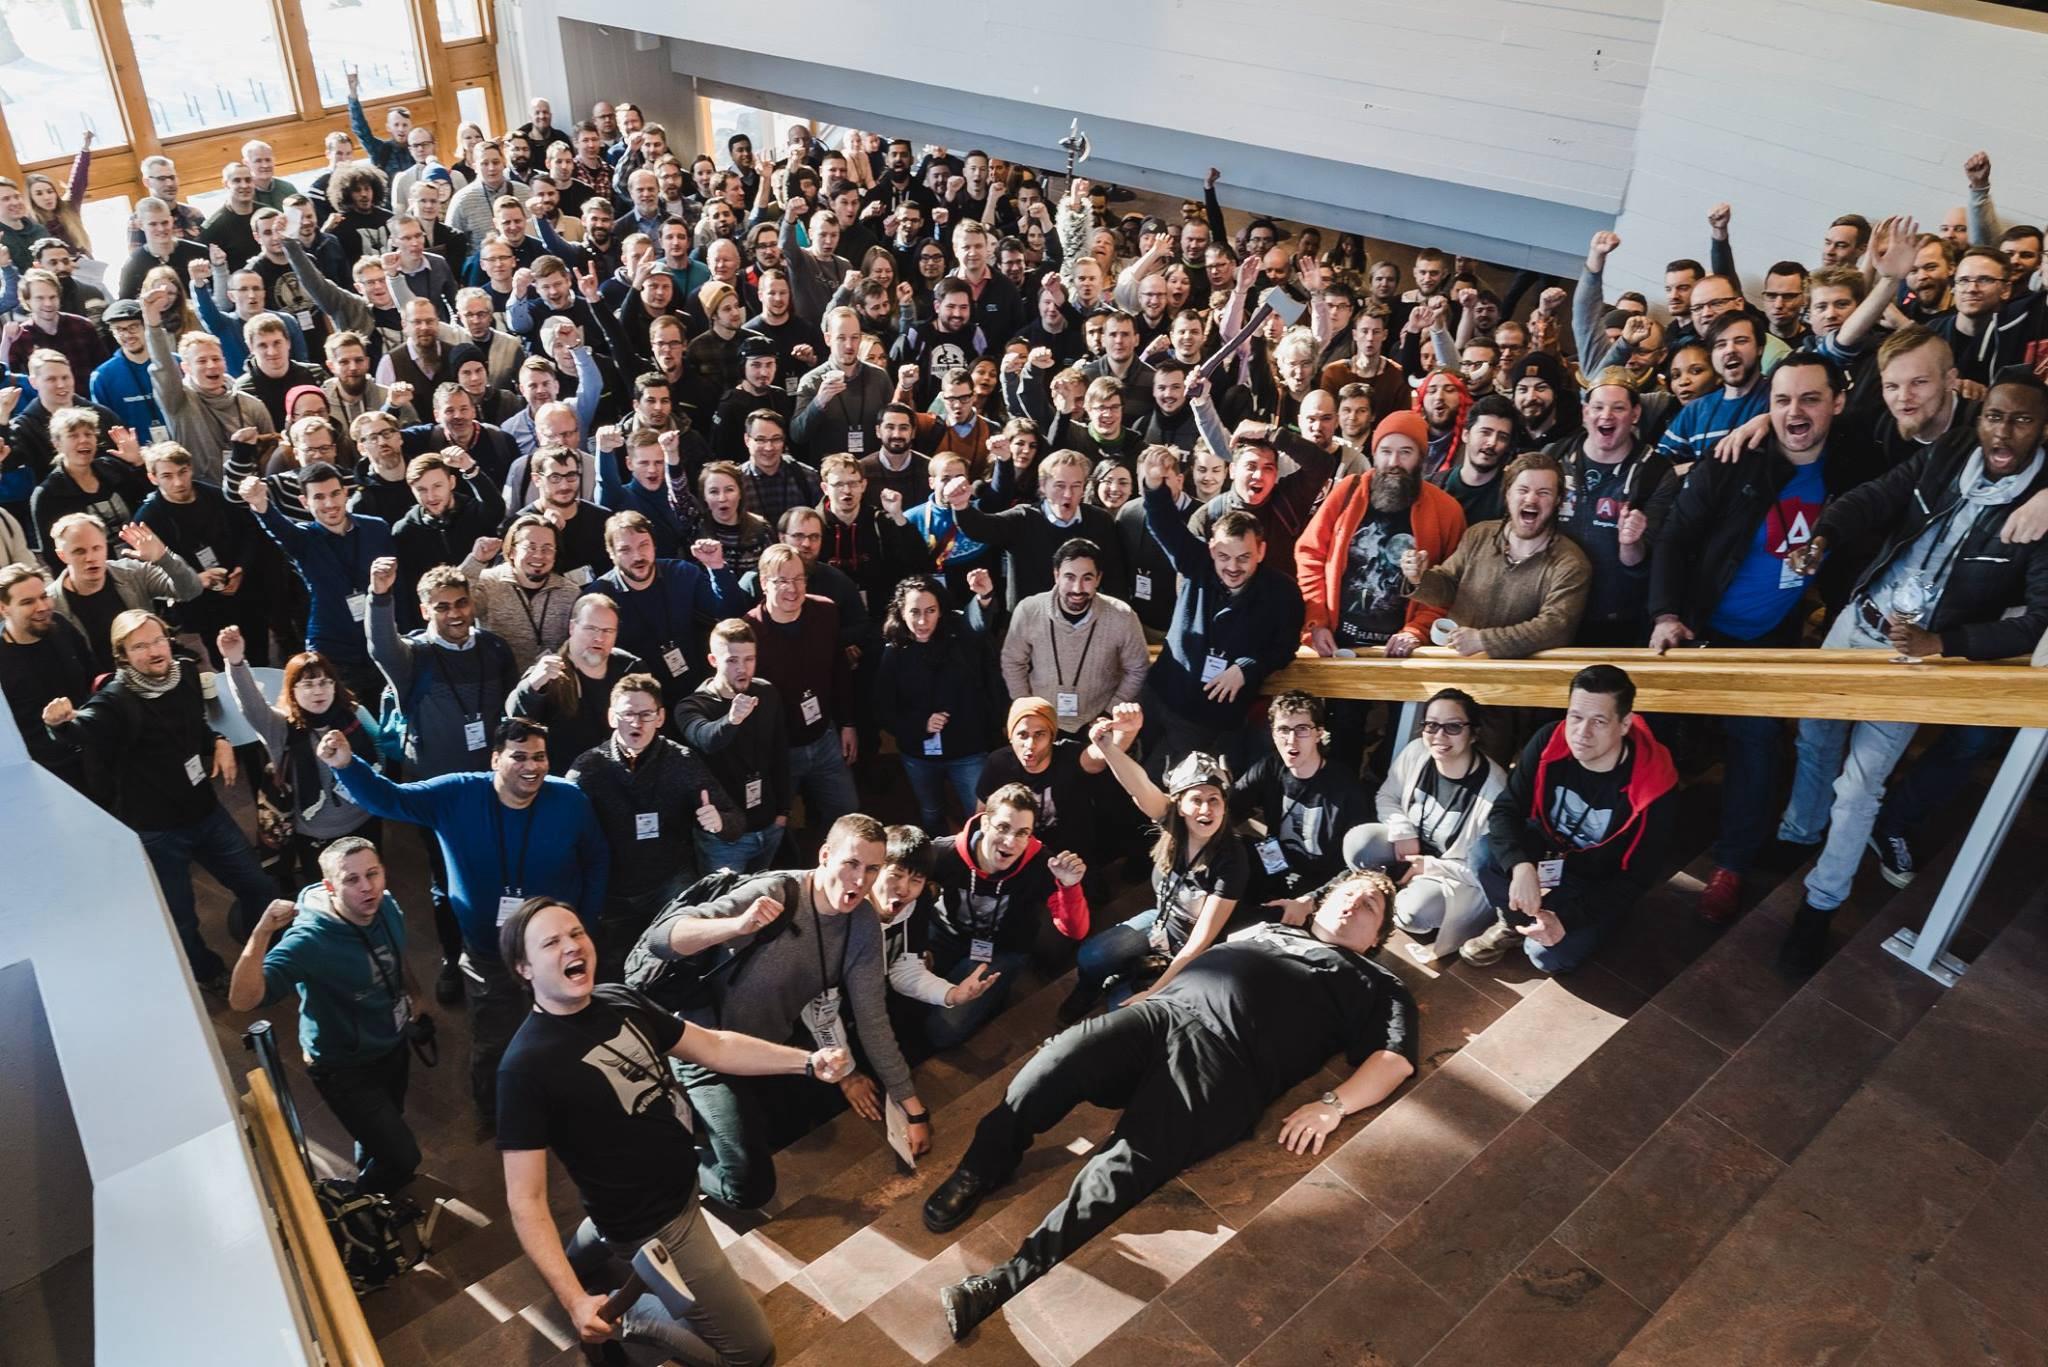 Over 300 developers attended ngVikings